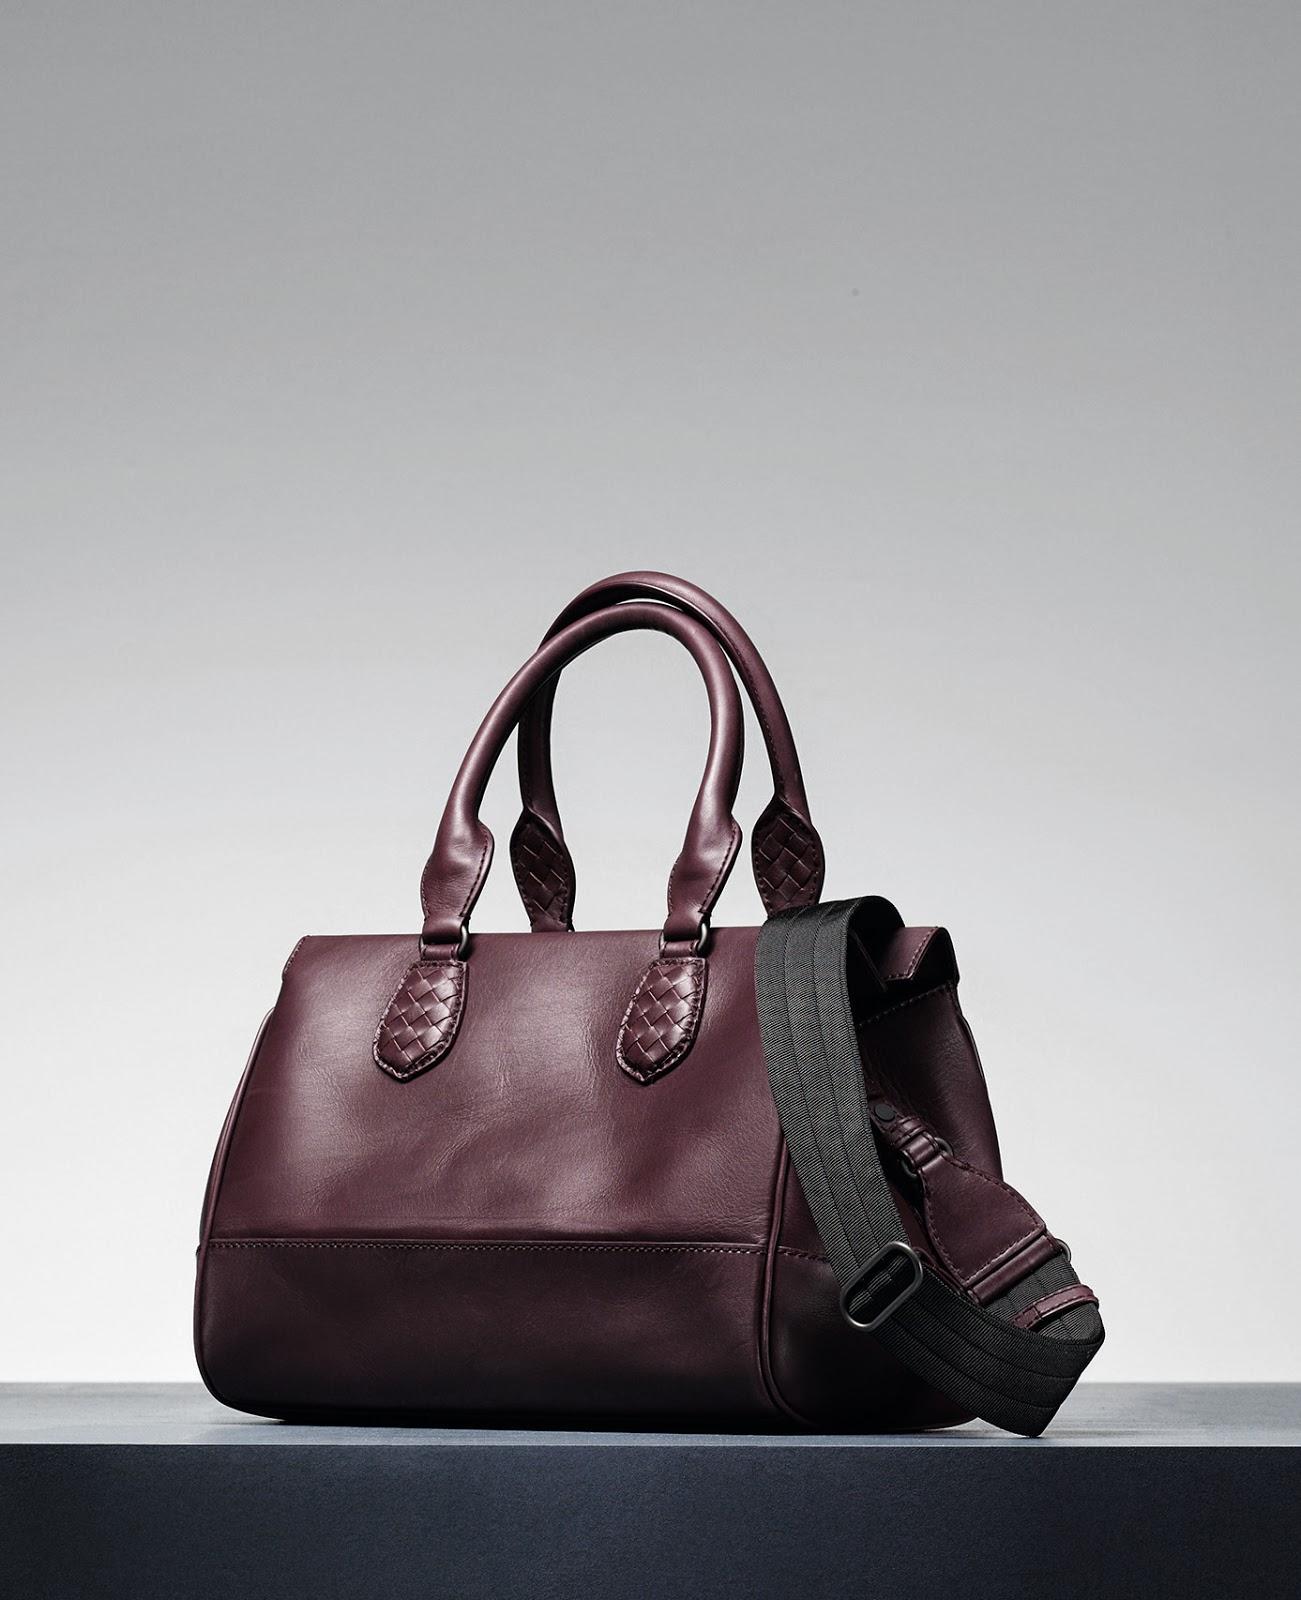 Bottega Veneta Introduces 3 Key Bags for Early Fall 2014